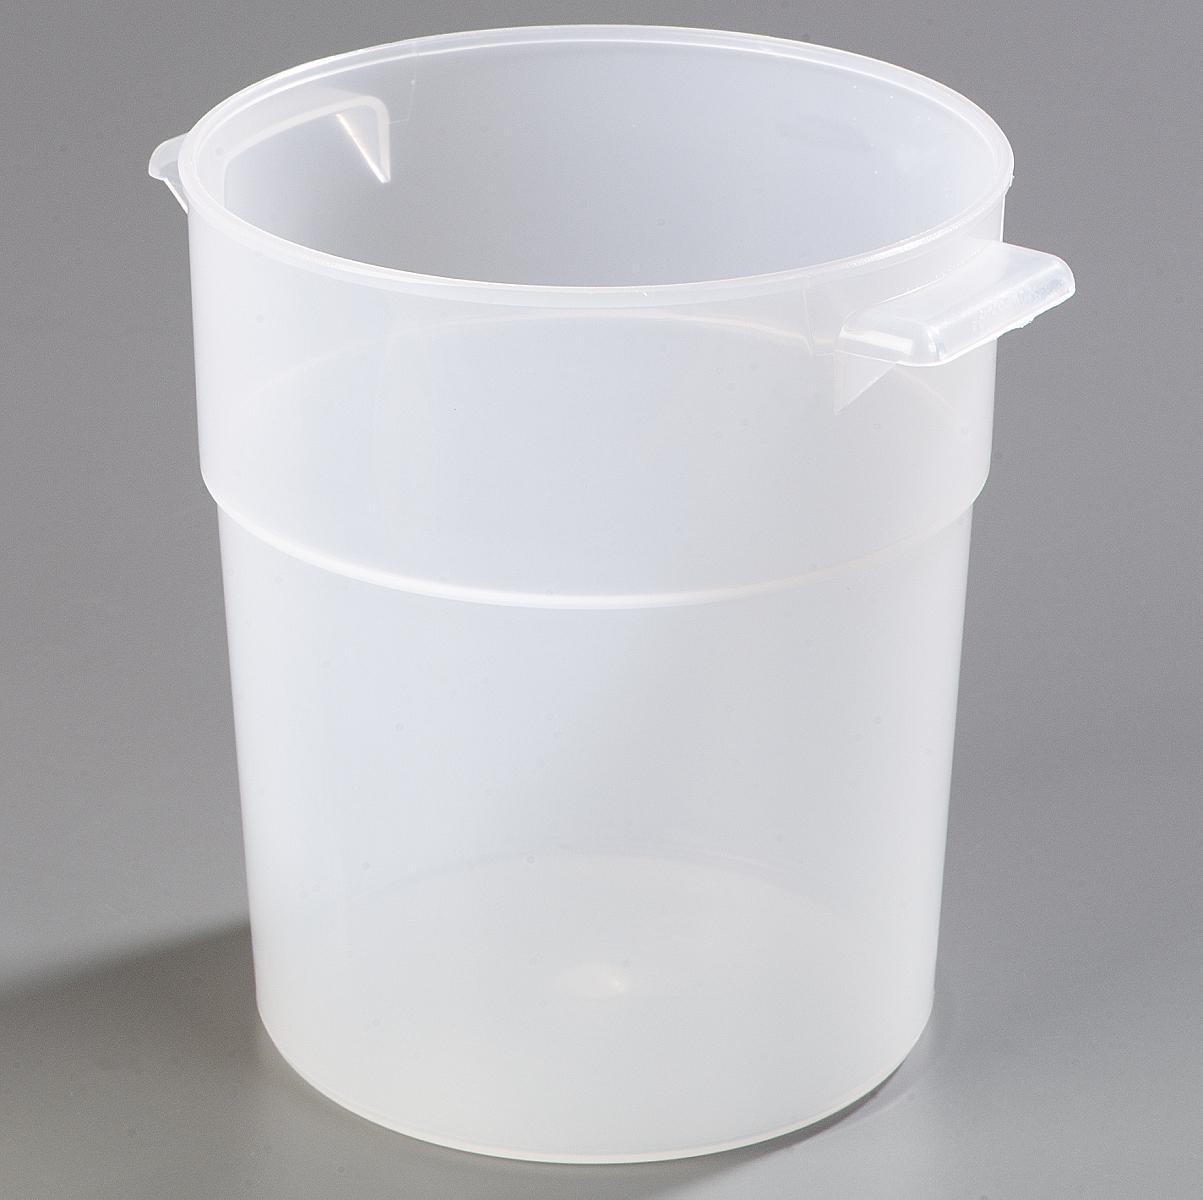 Bains Marie Container 3.5 qt - Translucent